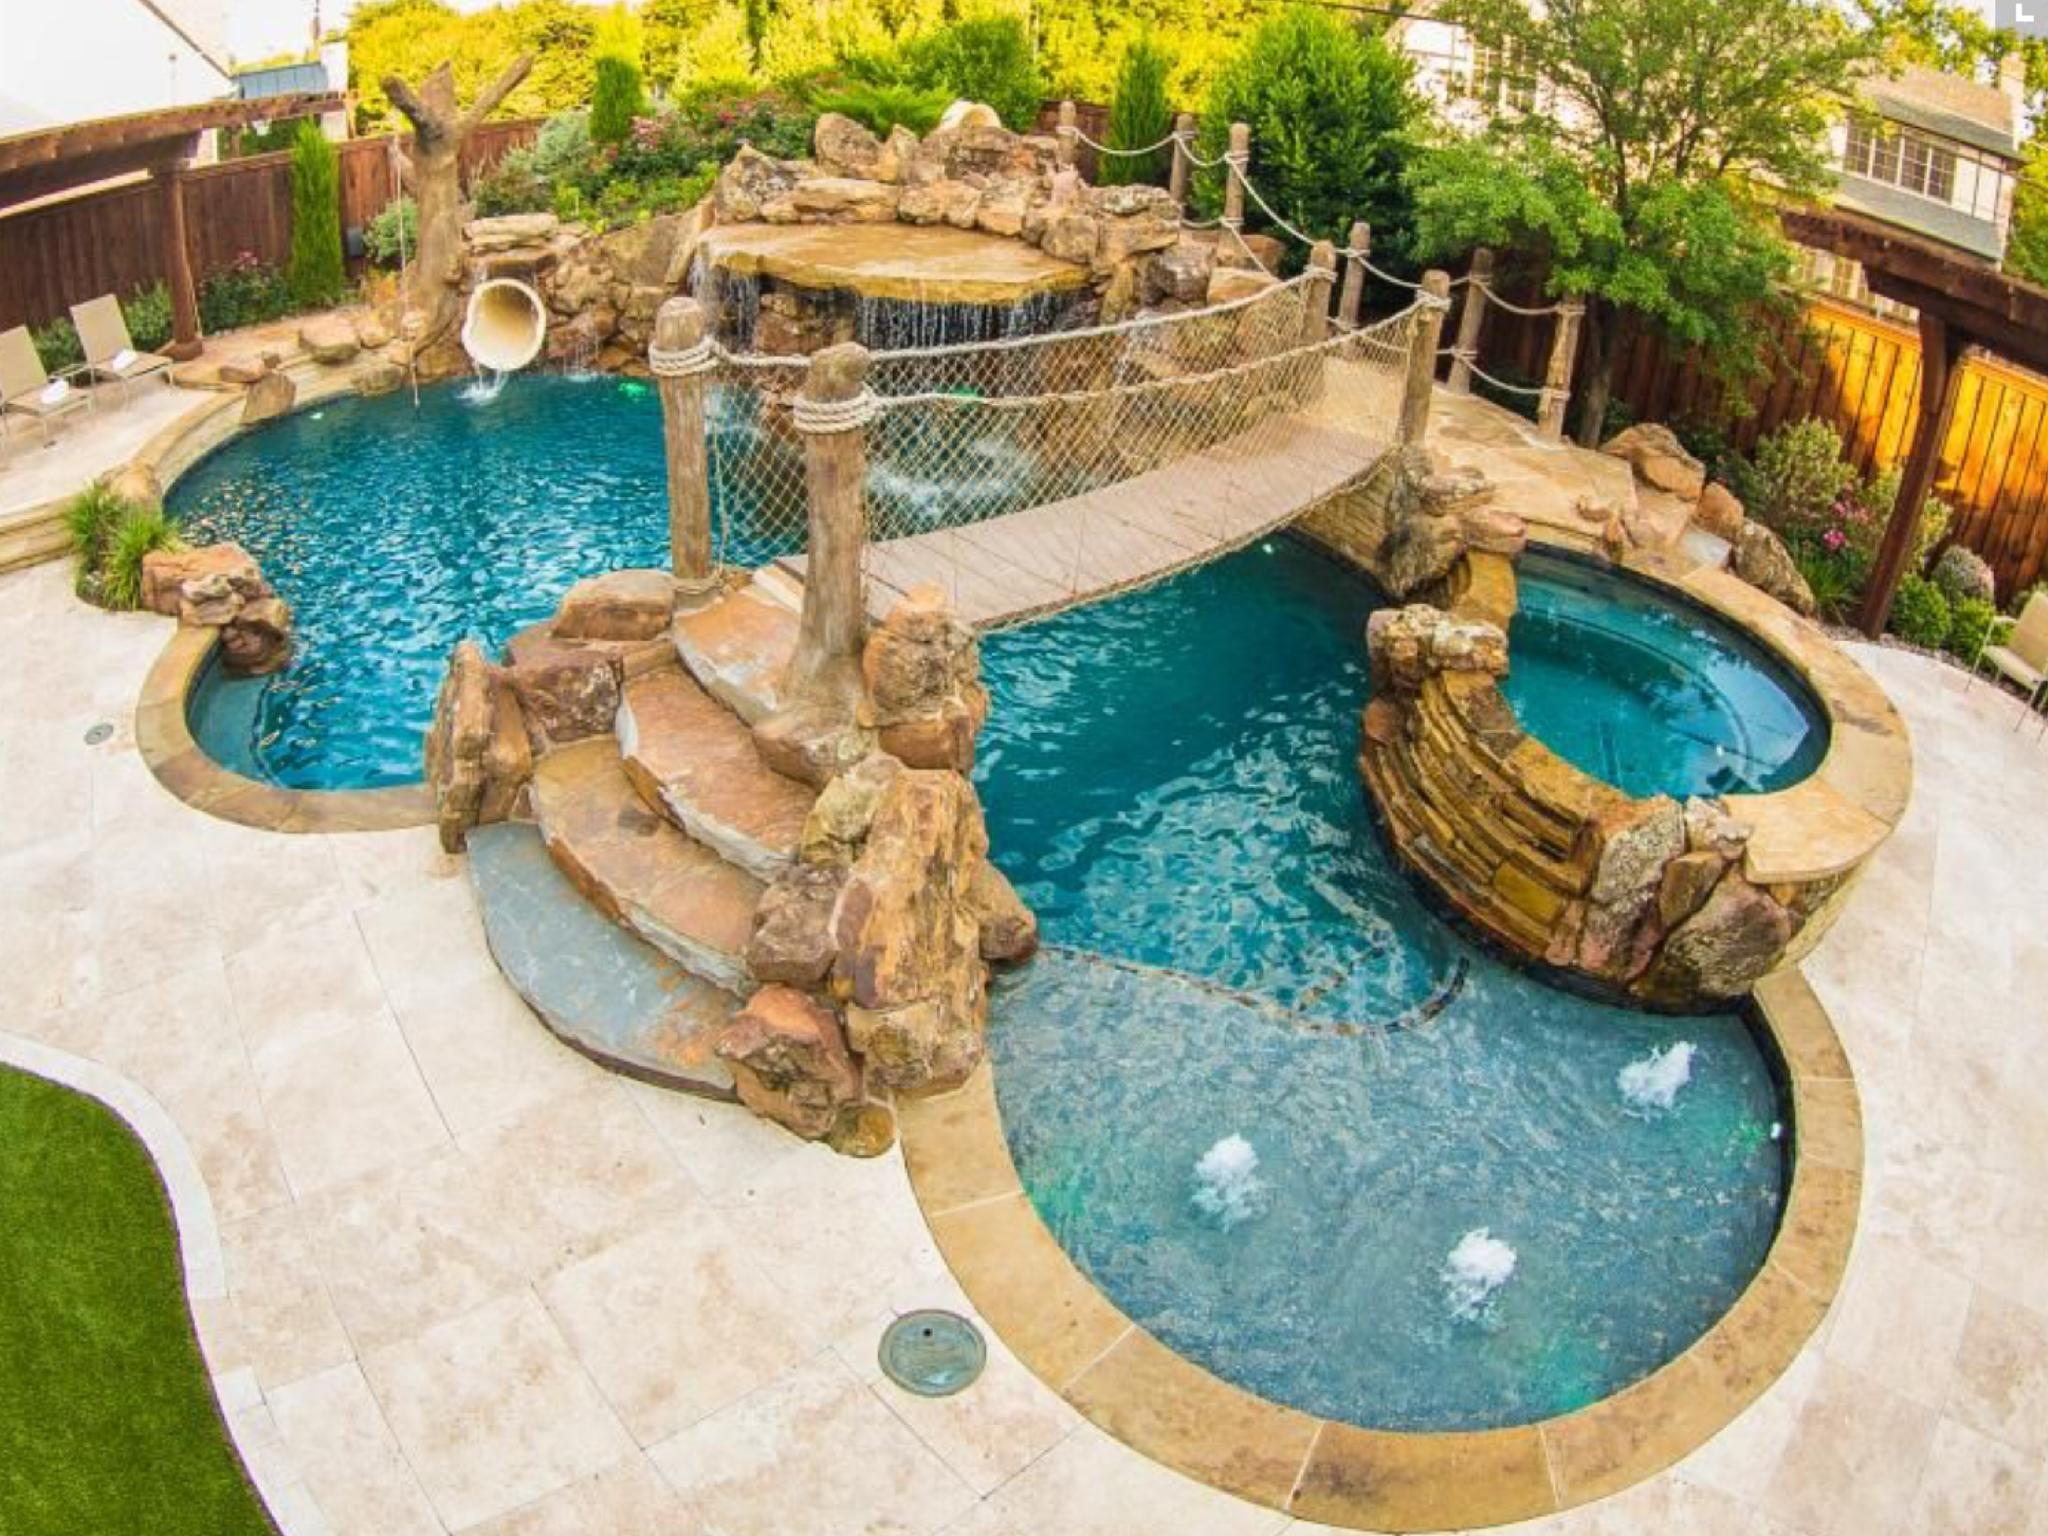 Dream Pool With Bridge Wade In Area Jacuzzi And Slide Dream Pools Backyard Pool Tropical Backyard